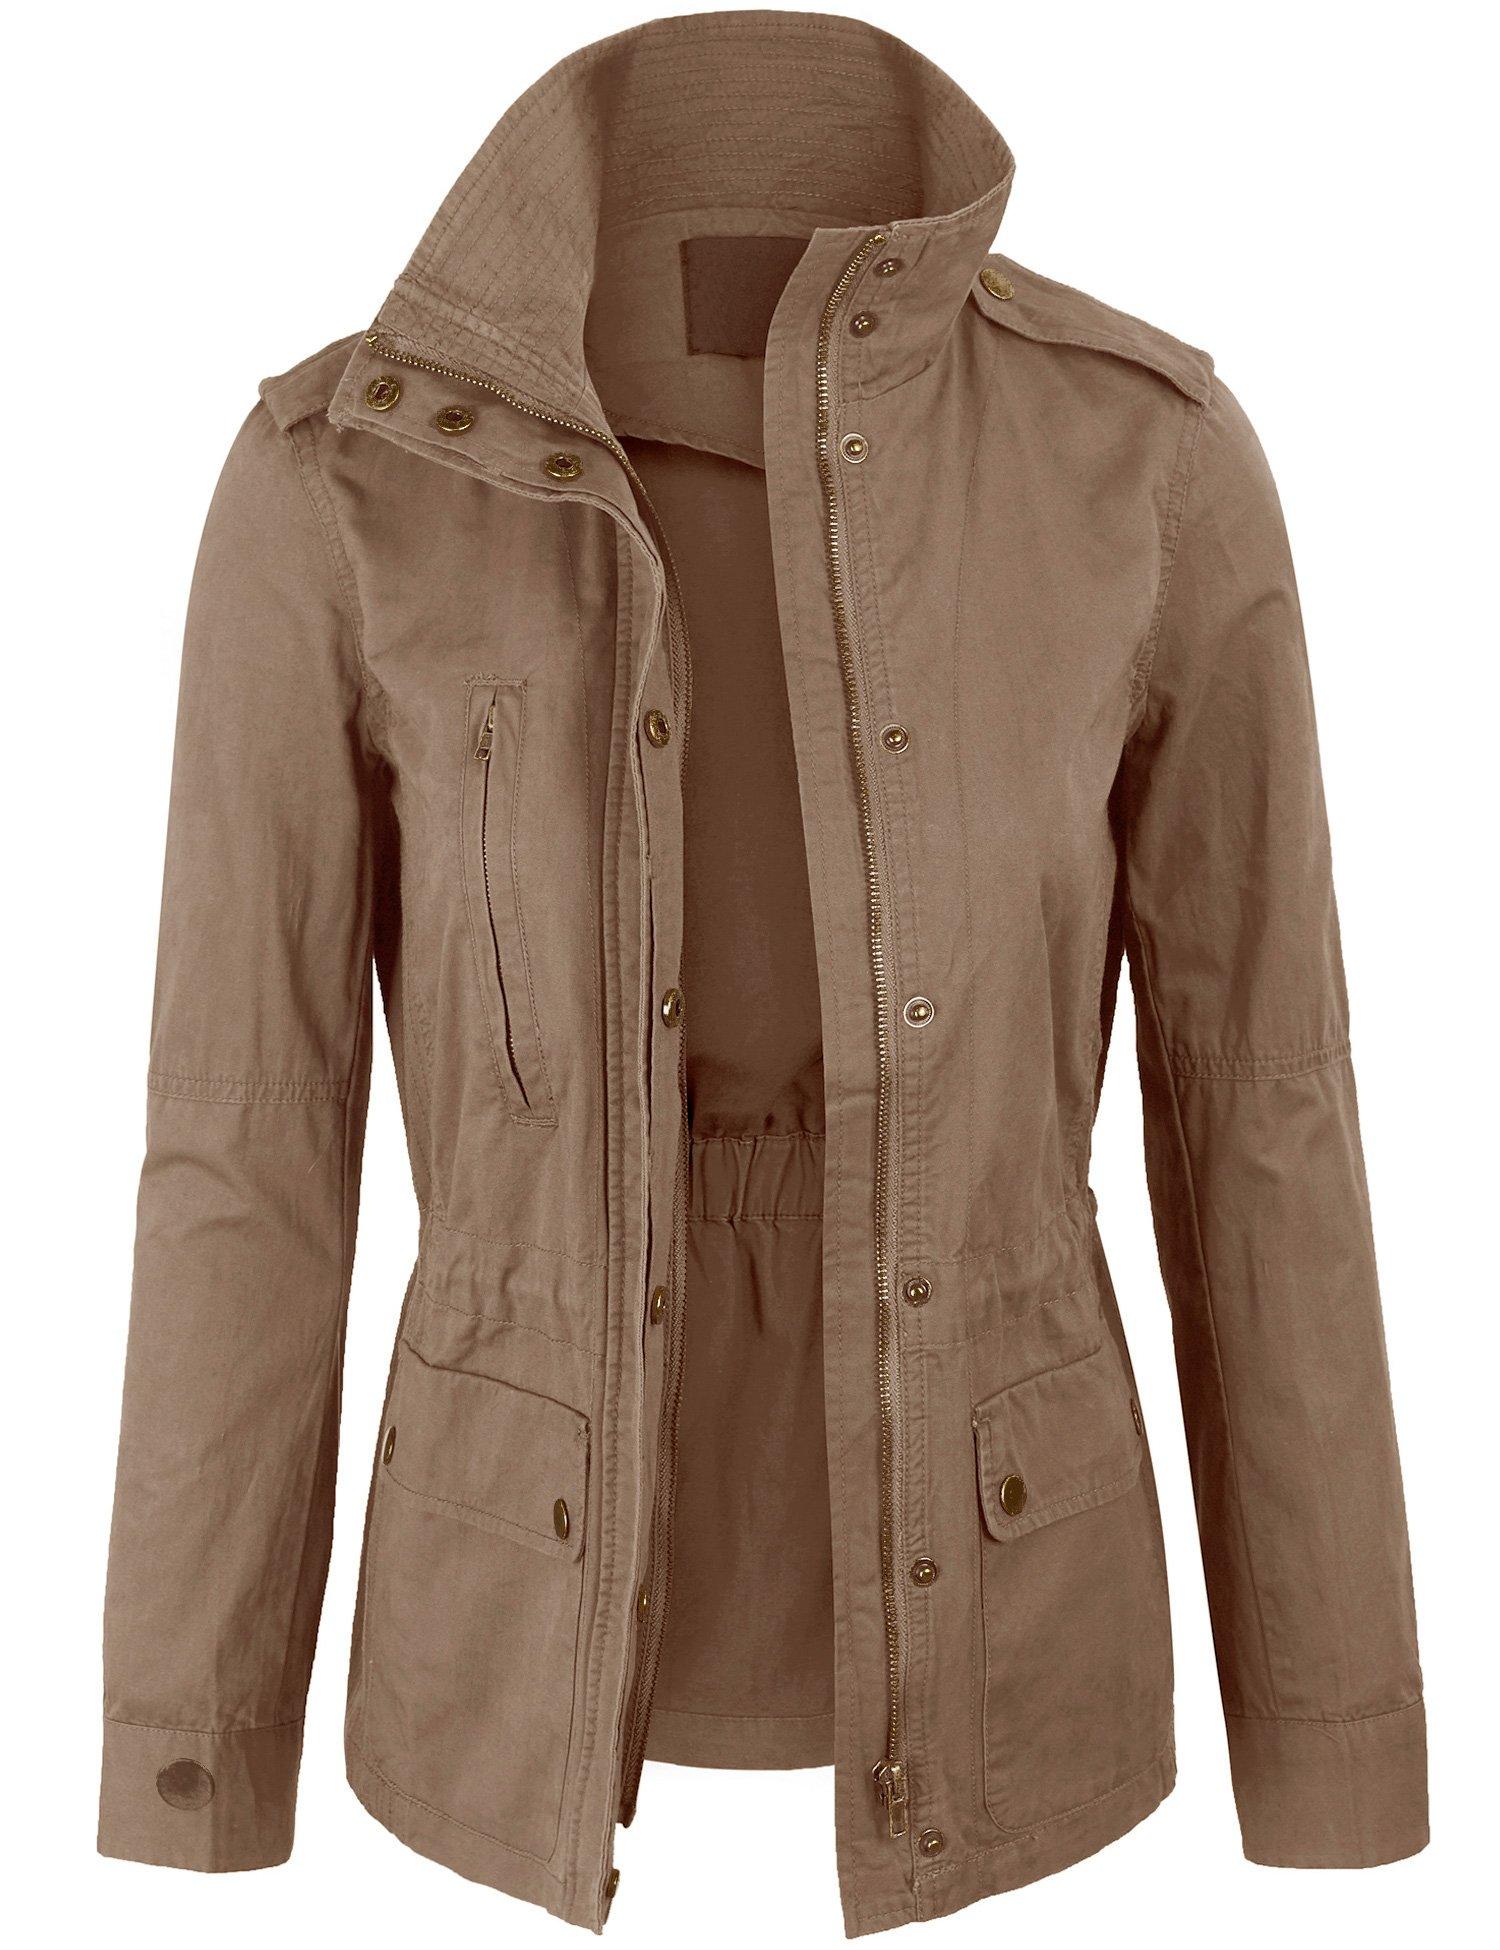 KOGMO Womens Zip up Military Anorak Safari Jacket Coat -XL-Khaki